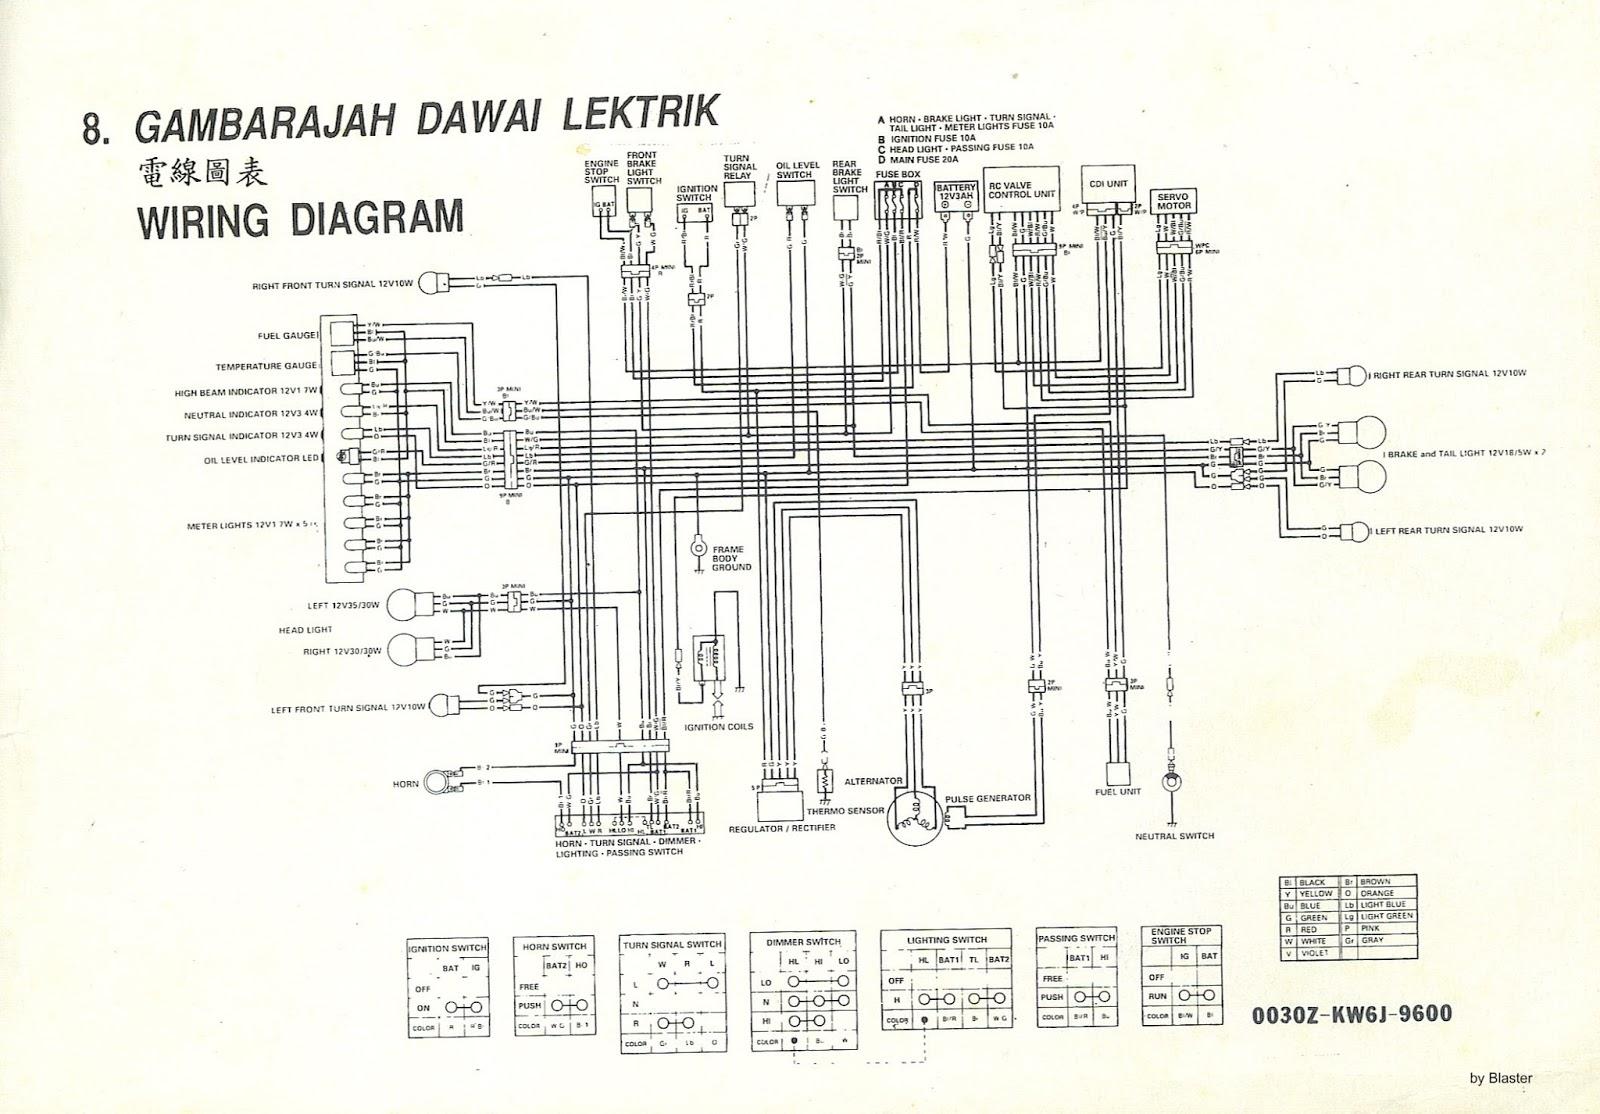 wiring diagram nsr 150 sp versi hitam putih [ 1600 x 1114 Pixel ]